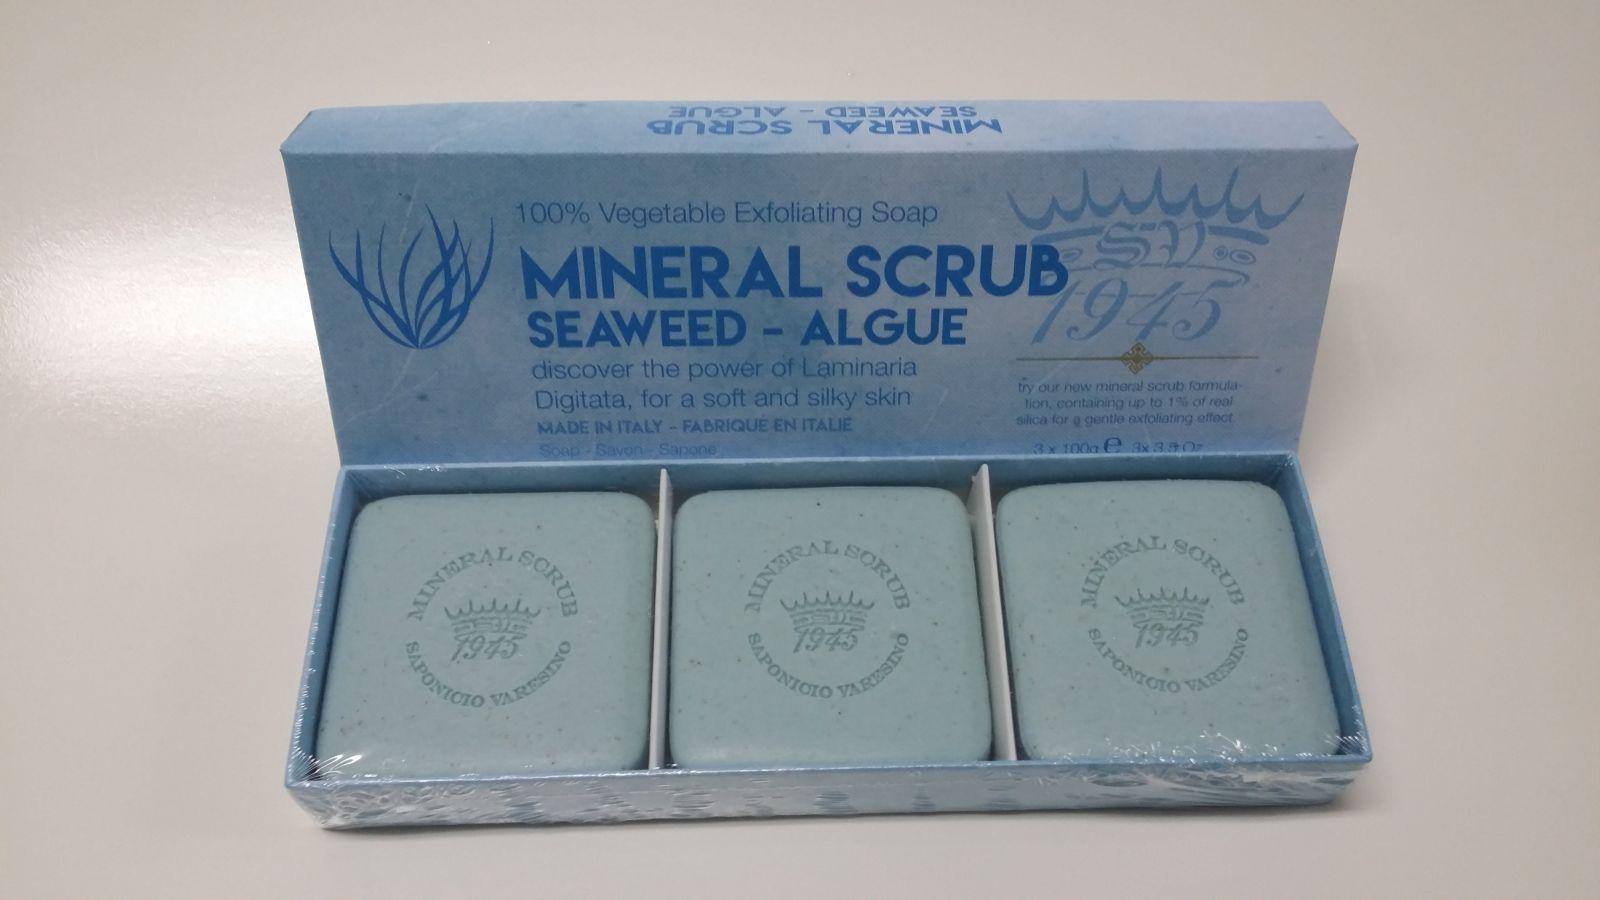 Saponificio Varesino - Mineral scrub Seaweed 3 x 100 g